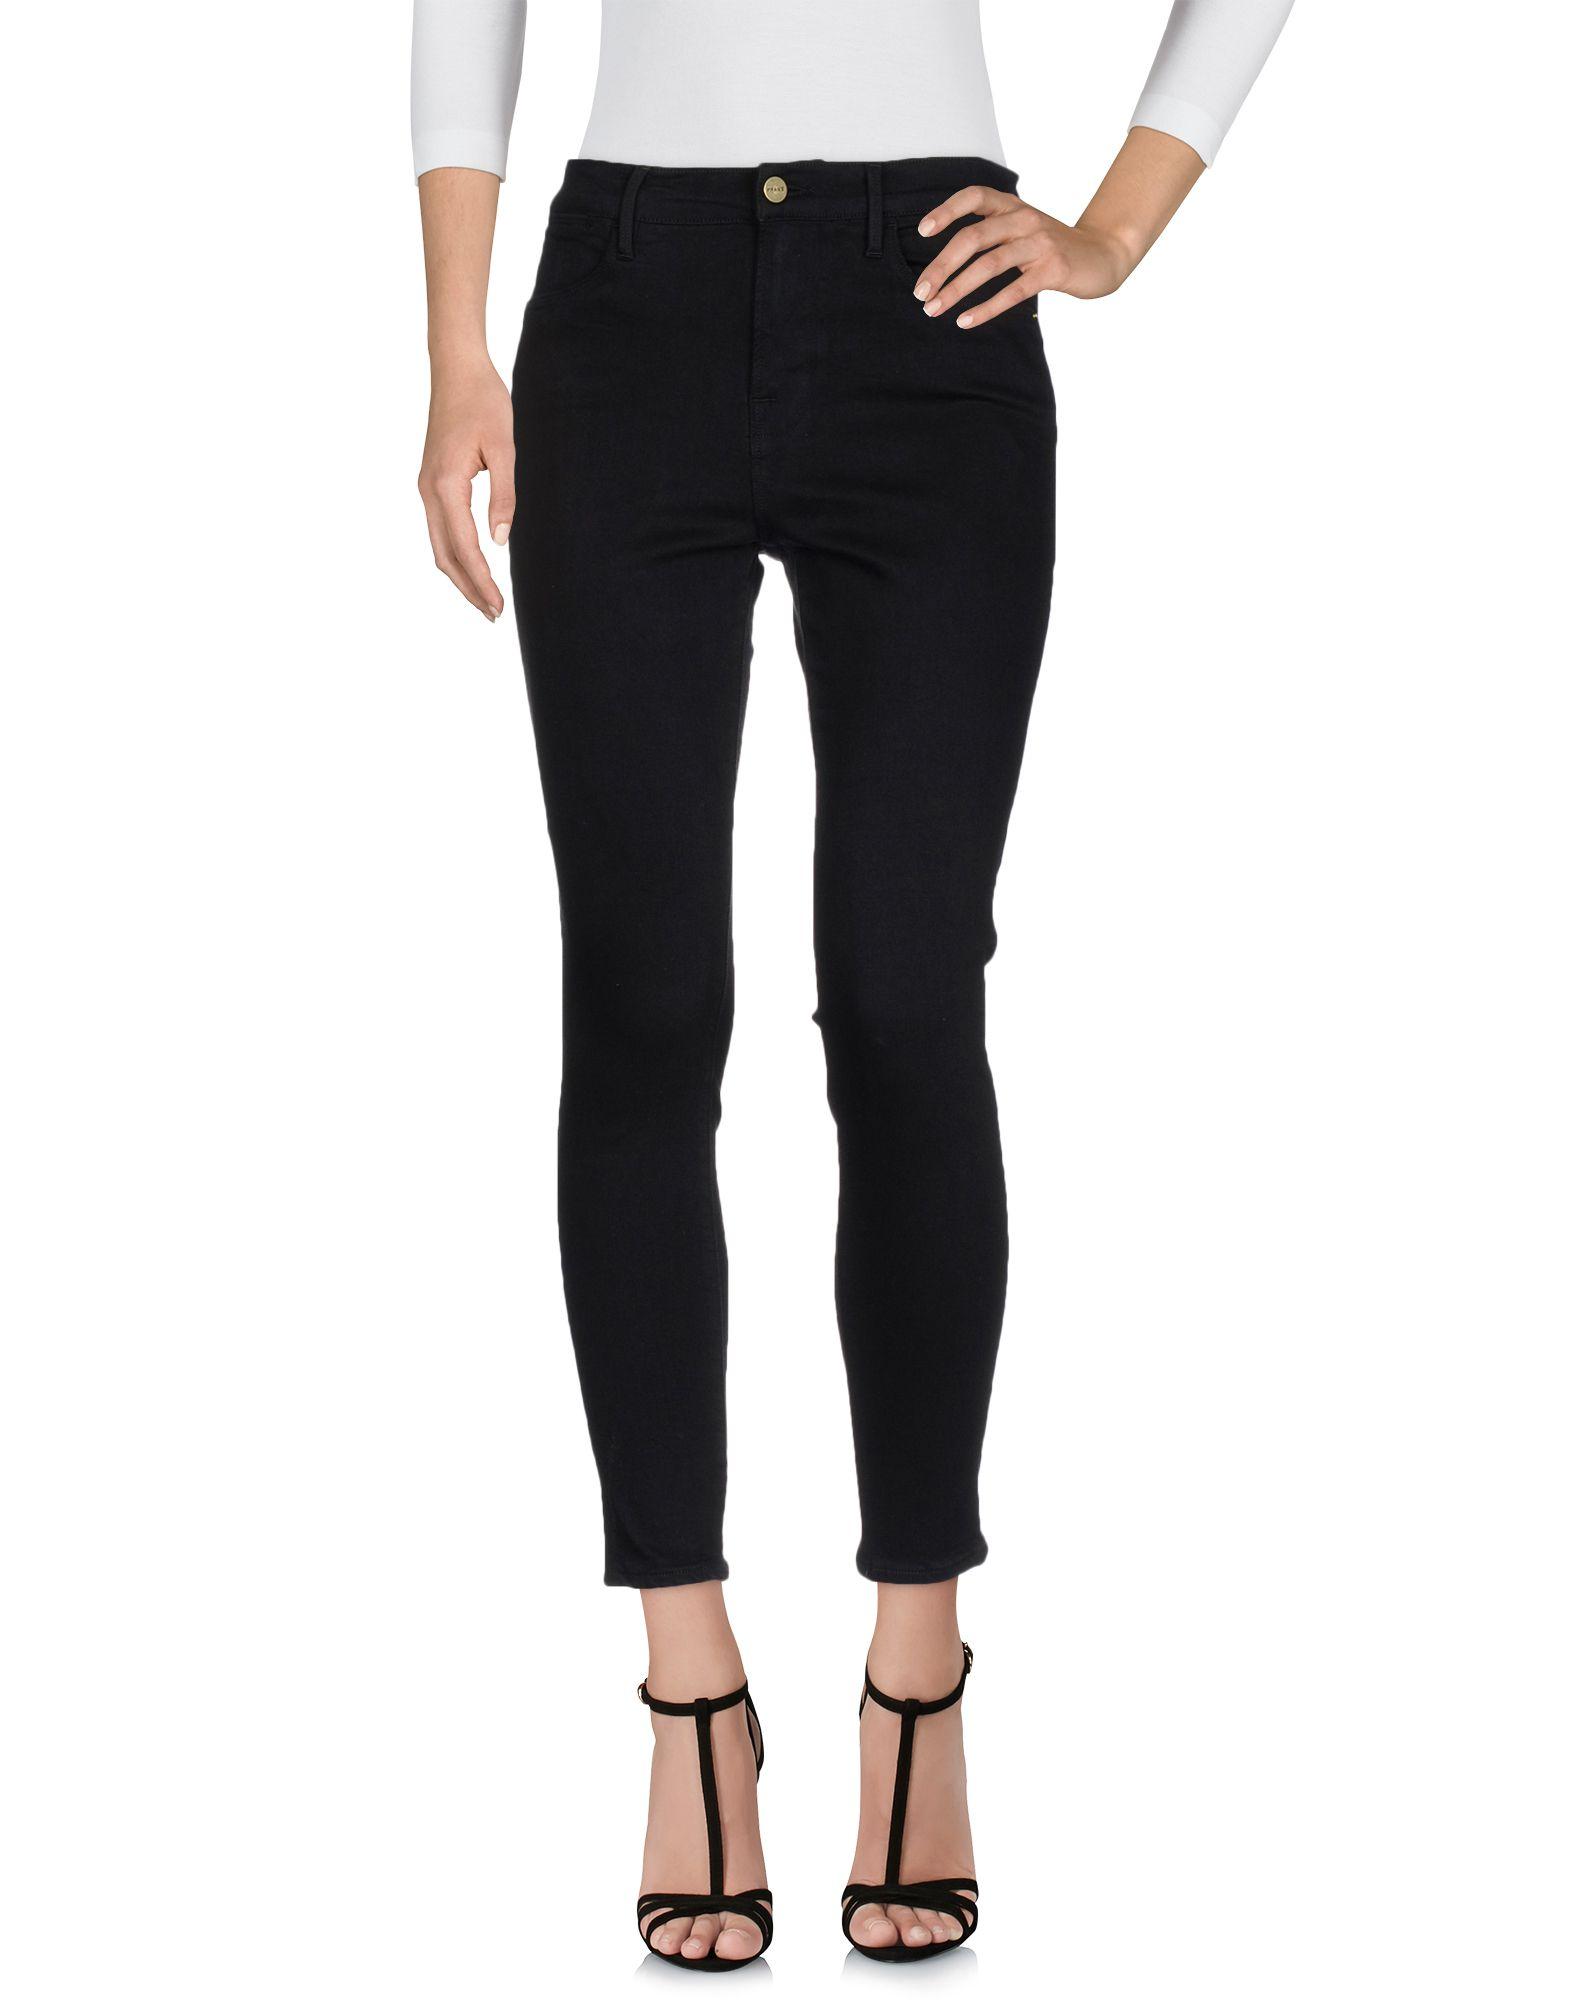 Pantaloni Jeans Frame Donna - Acquista online su 0u00Om